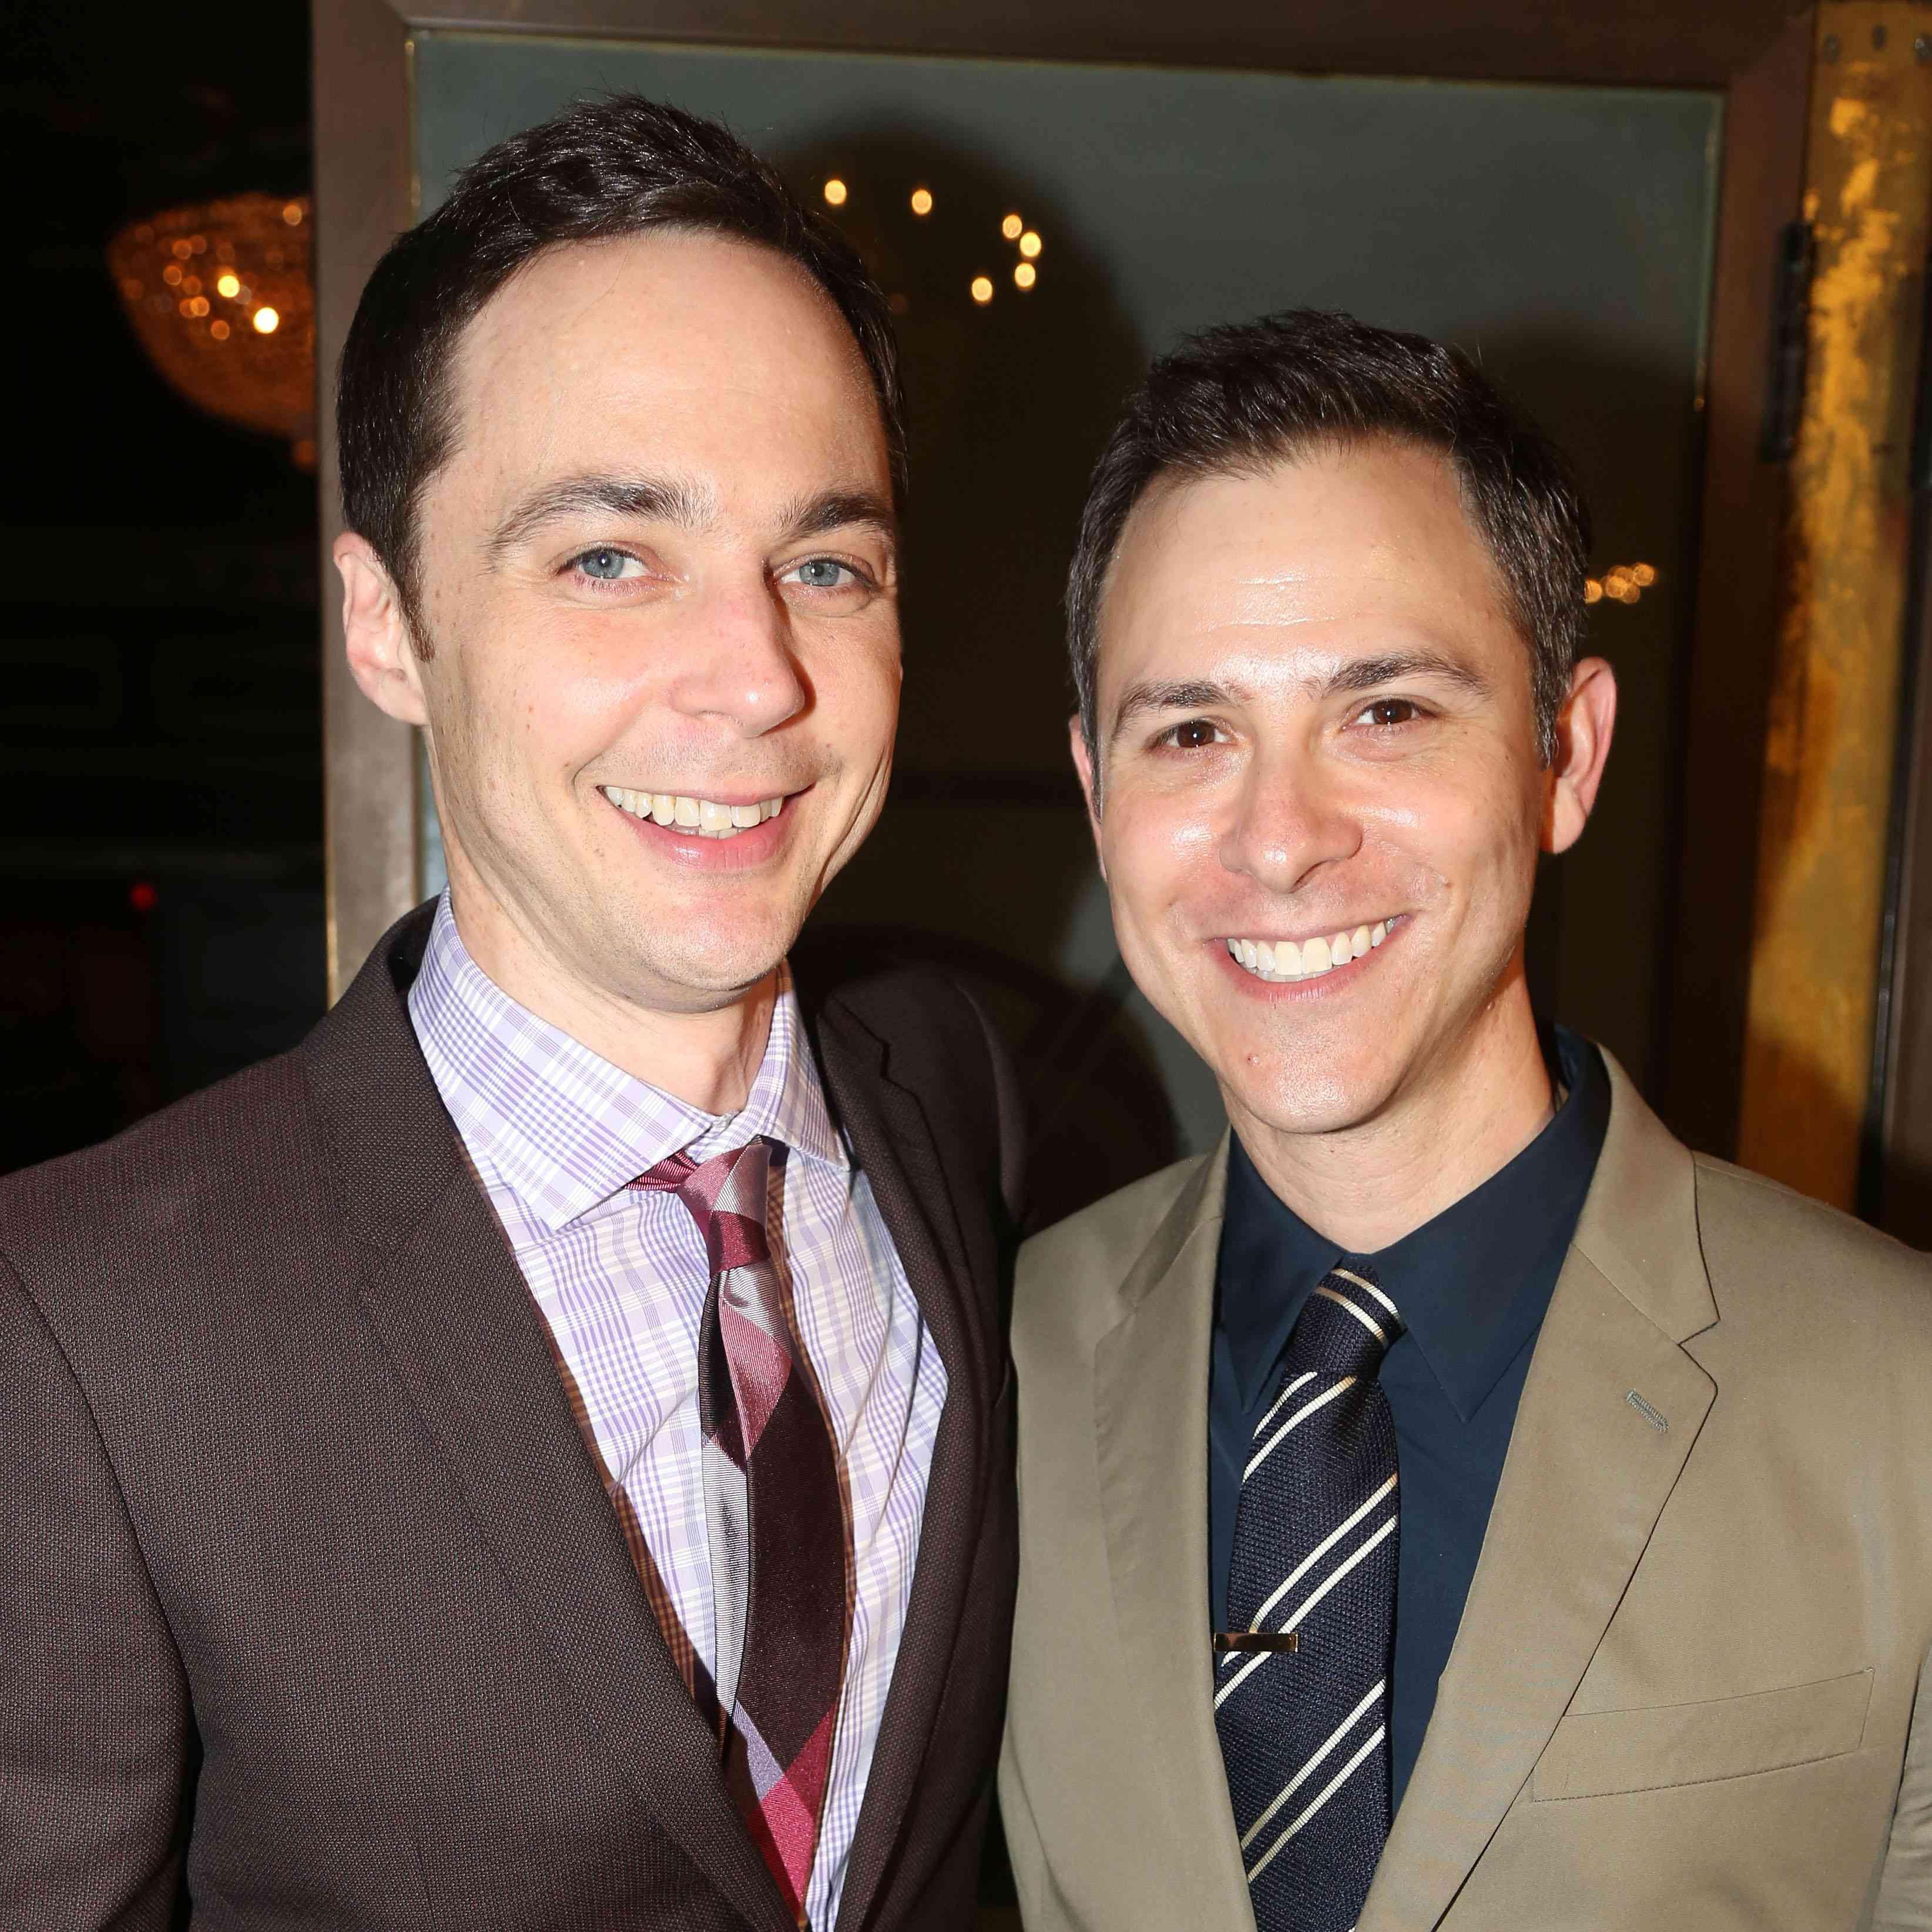 Jim Parsons Wedding: Jim Parsons Just Married Longtime Boyfriend Todd Spiewak